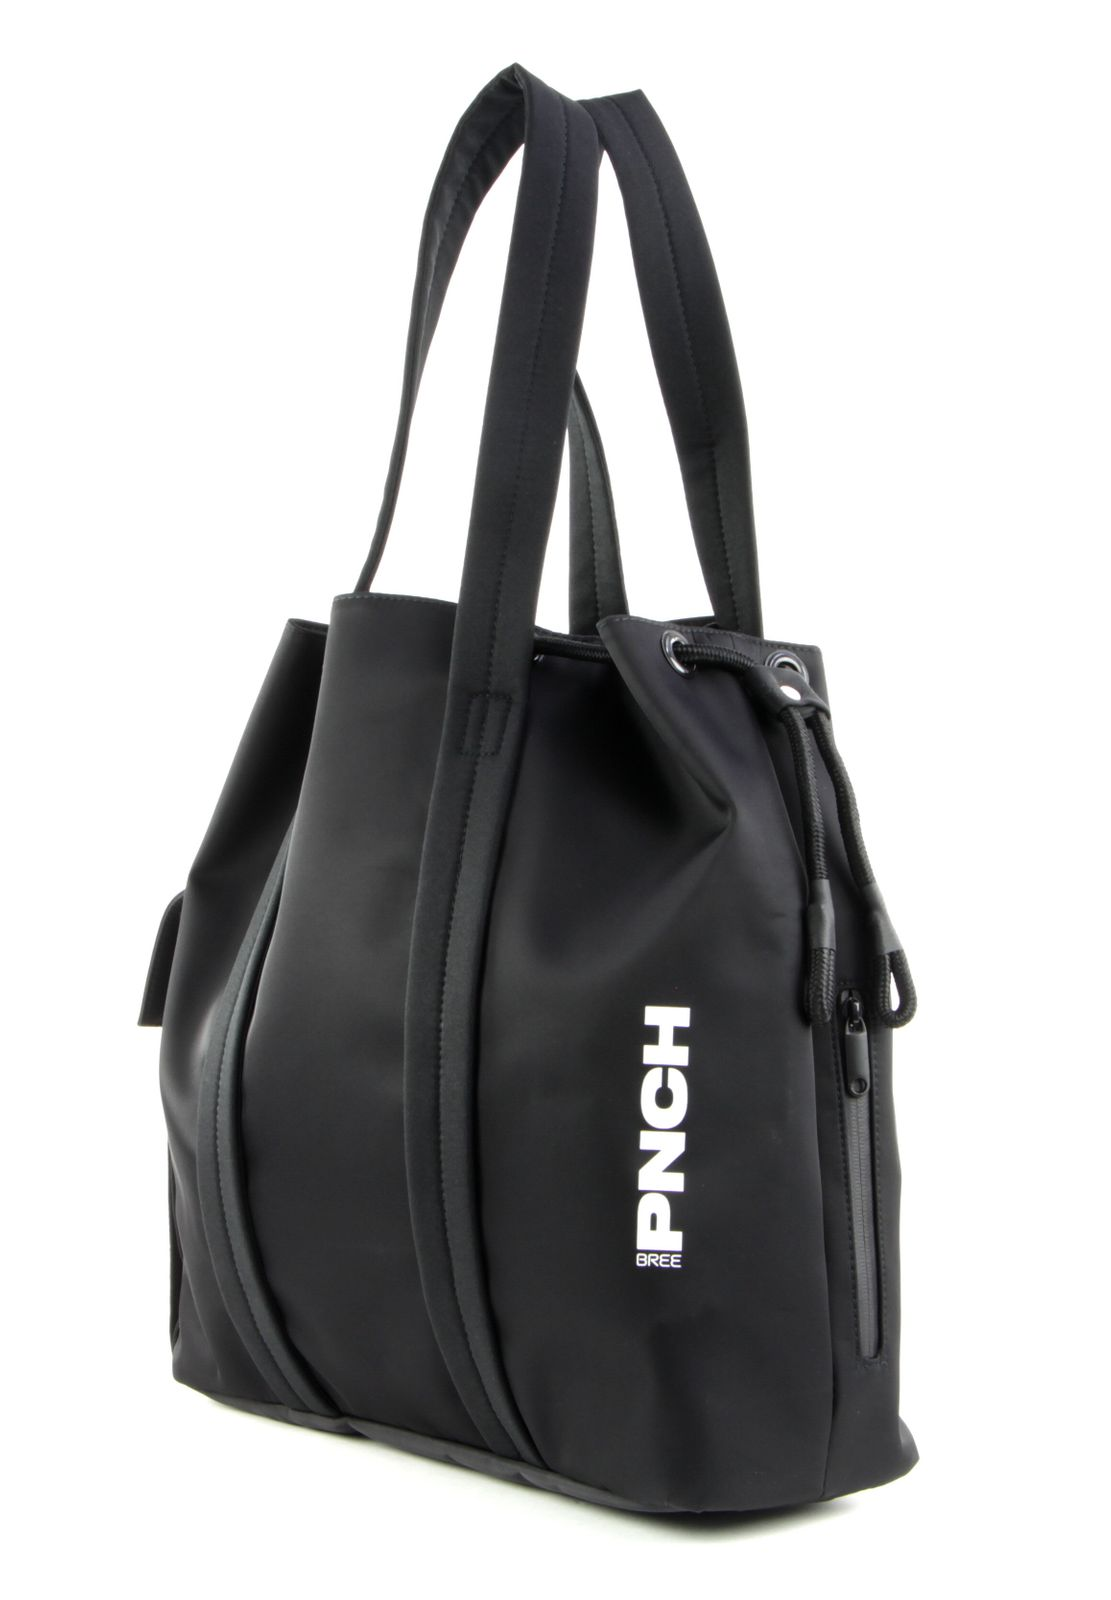 BREE Punch Neo 3 Shopper Black